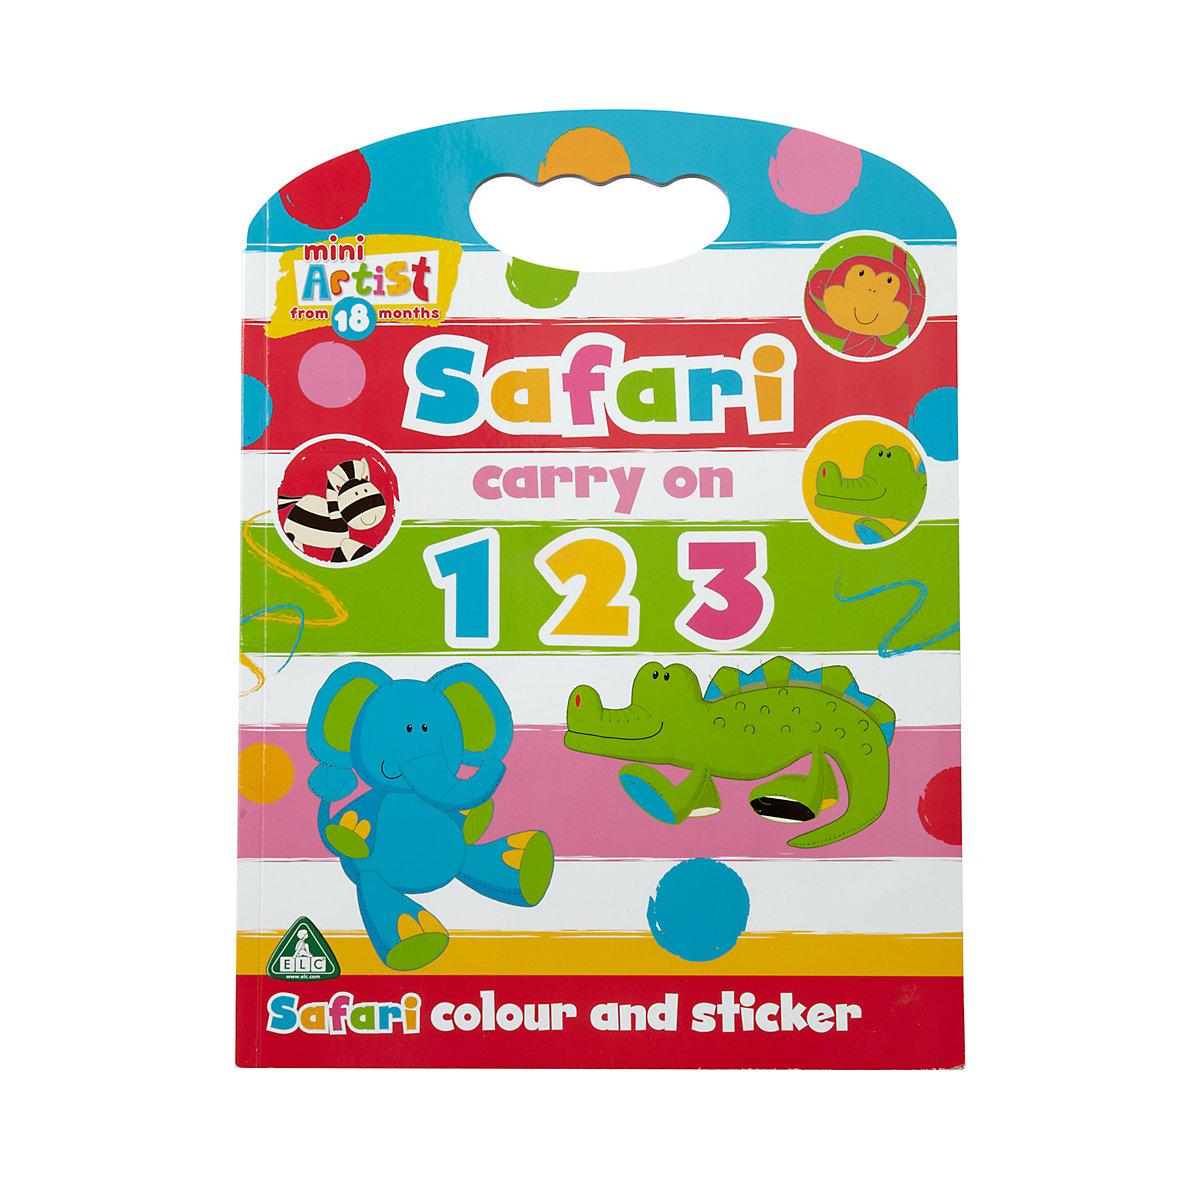 New ELC Mini Artist Boys Girls 123 Colour Sticker Activity Book Toy 18 months - Artist Gifts